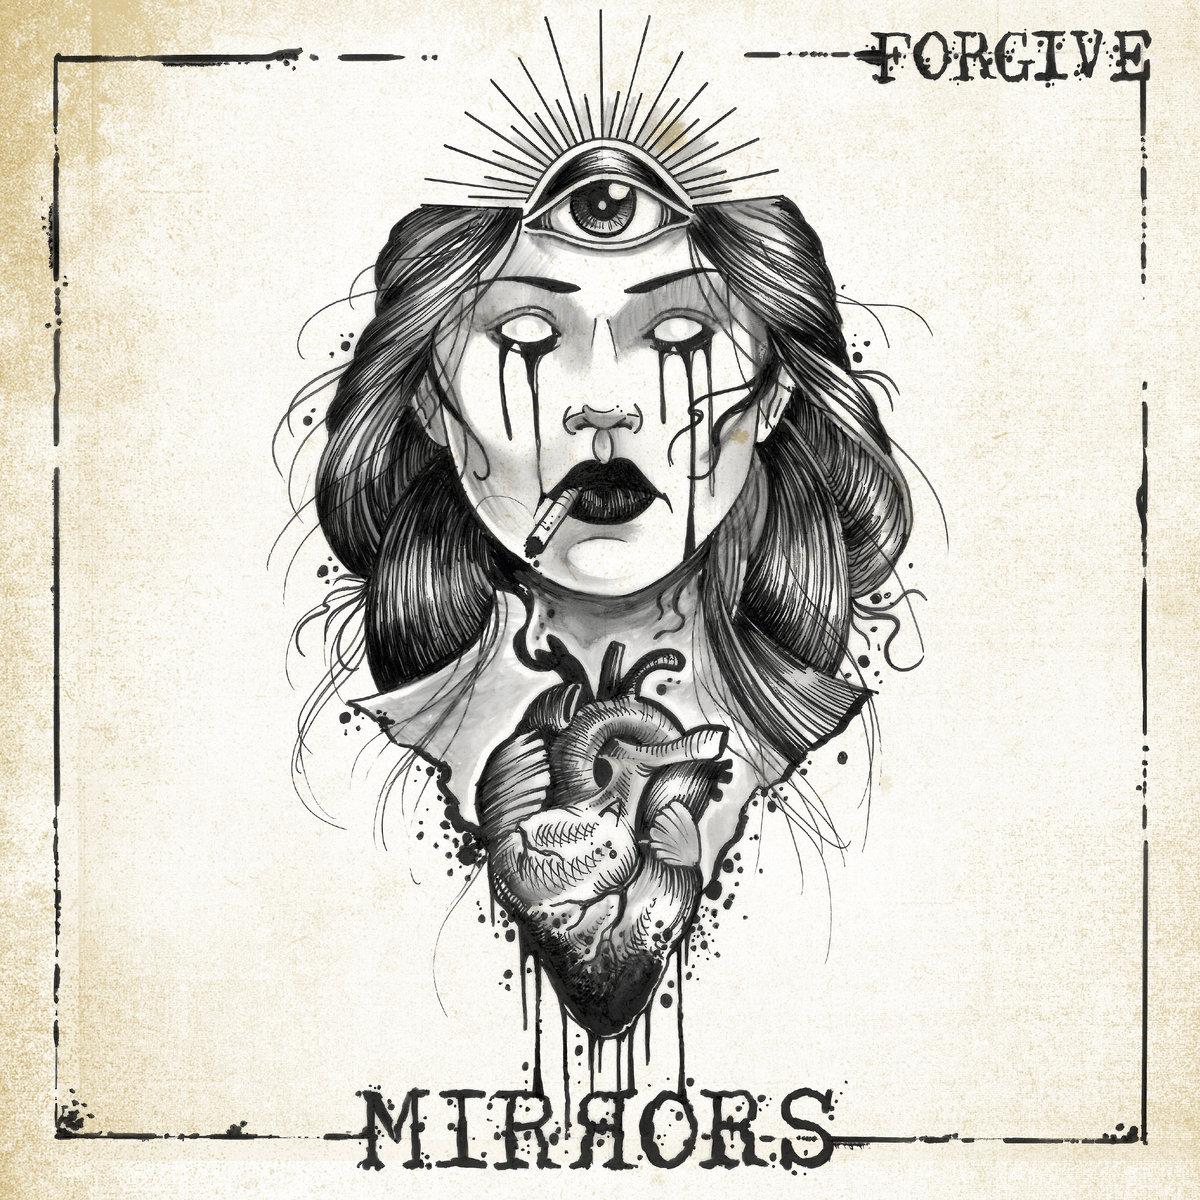 Forgive - Mirrors (2020)